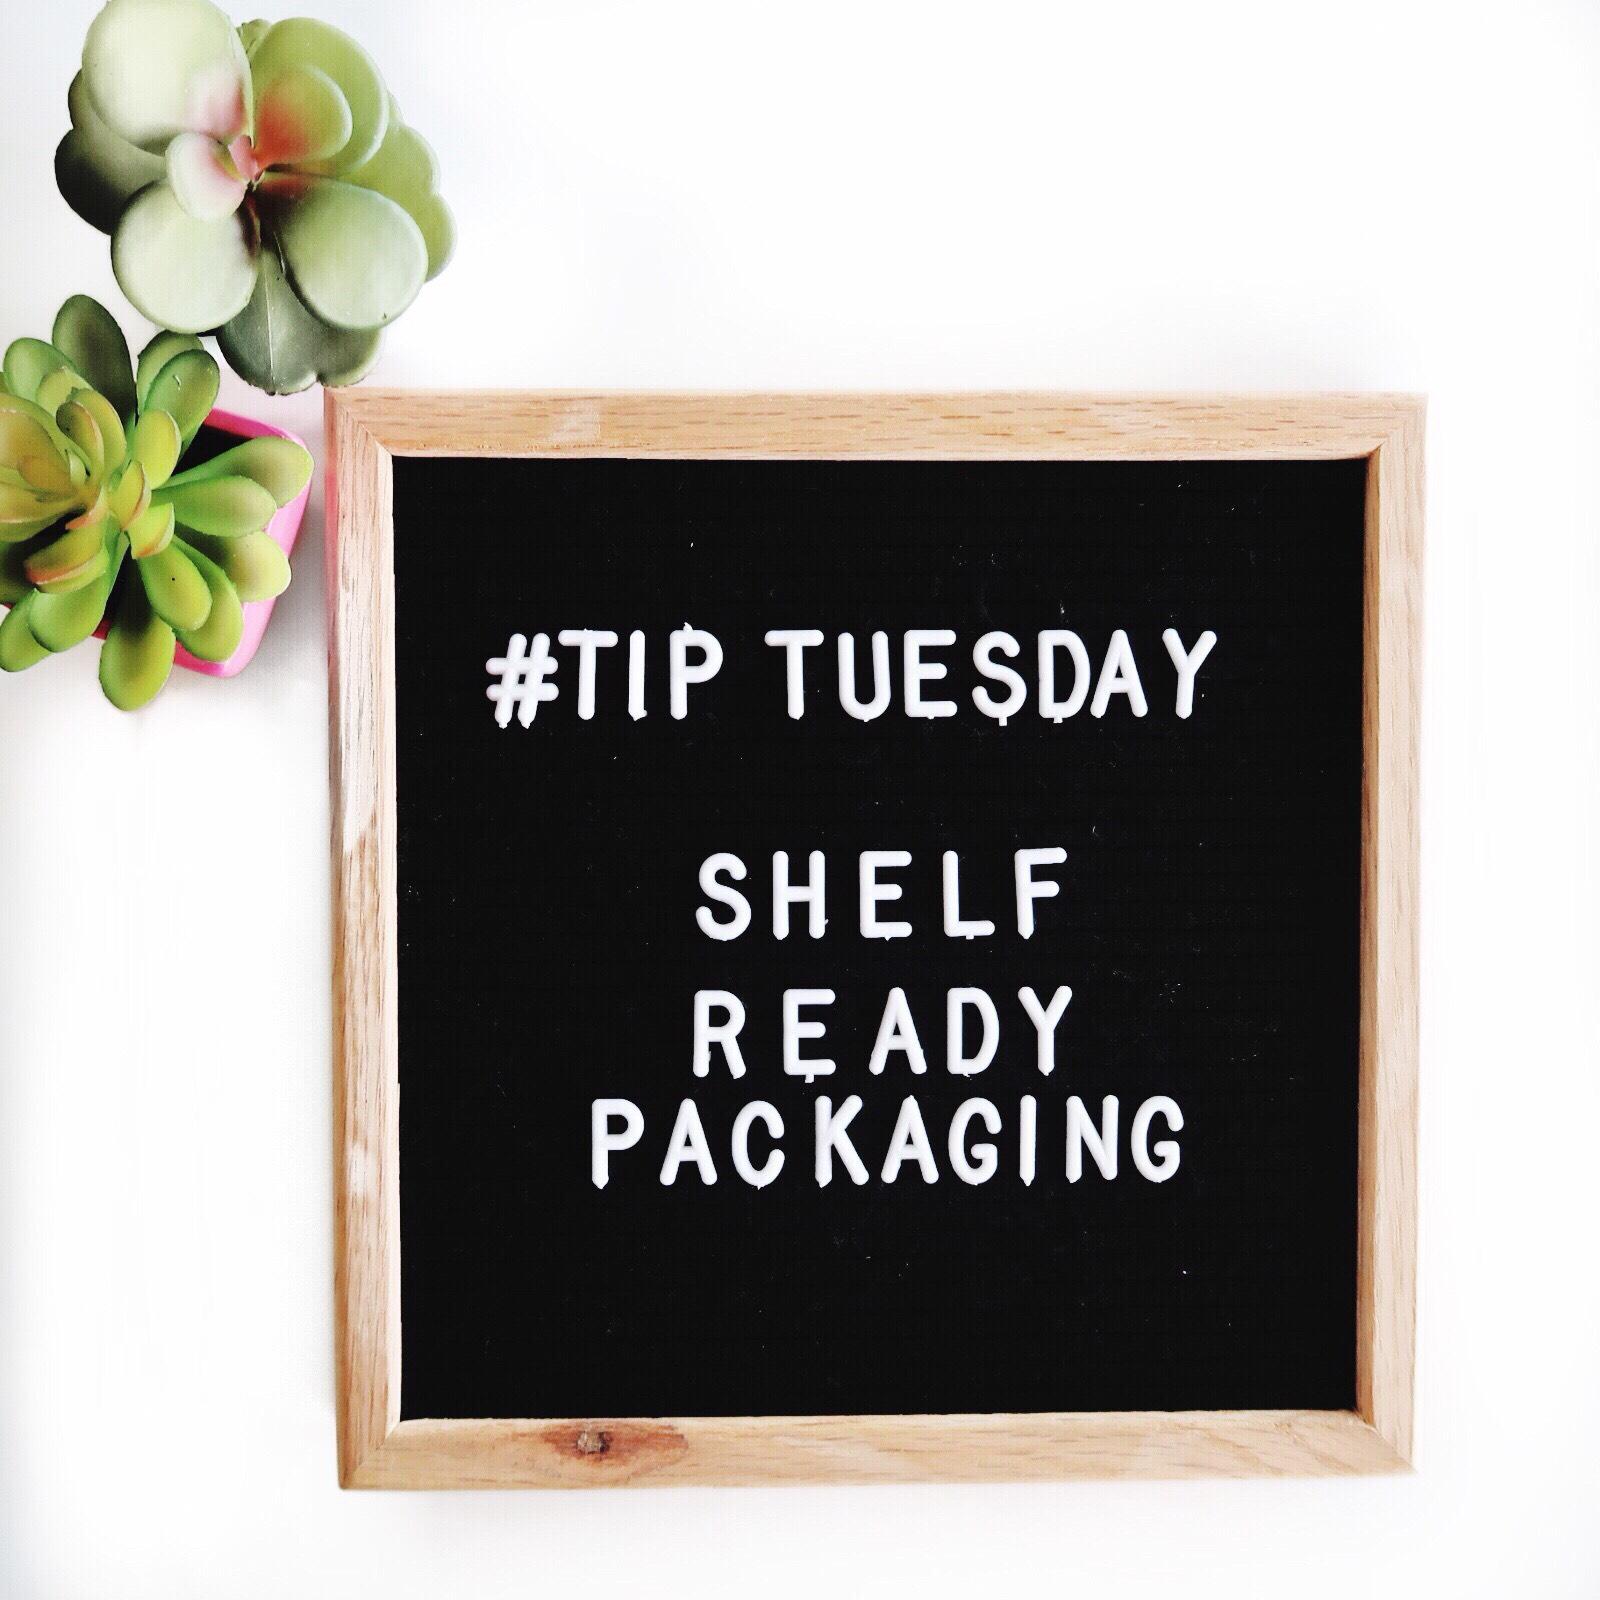 Tip Tuesday Shelf Ready Packaging - Lentz & Company